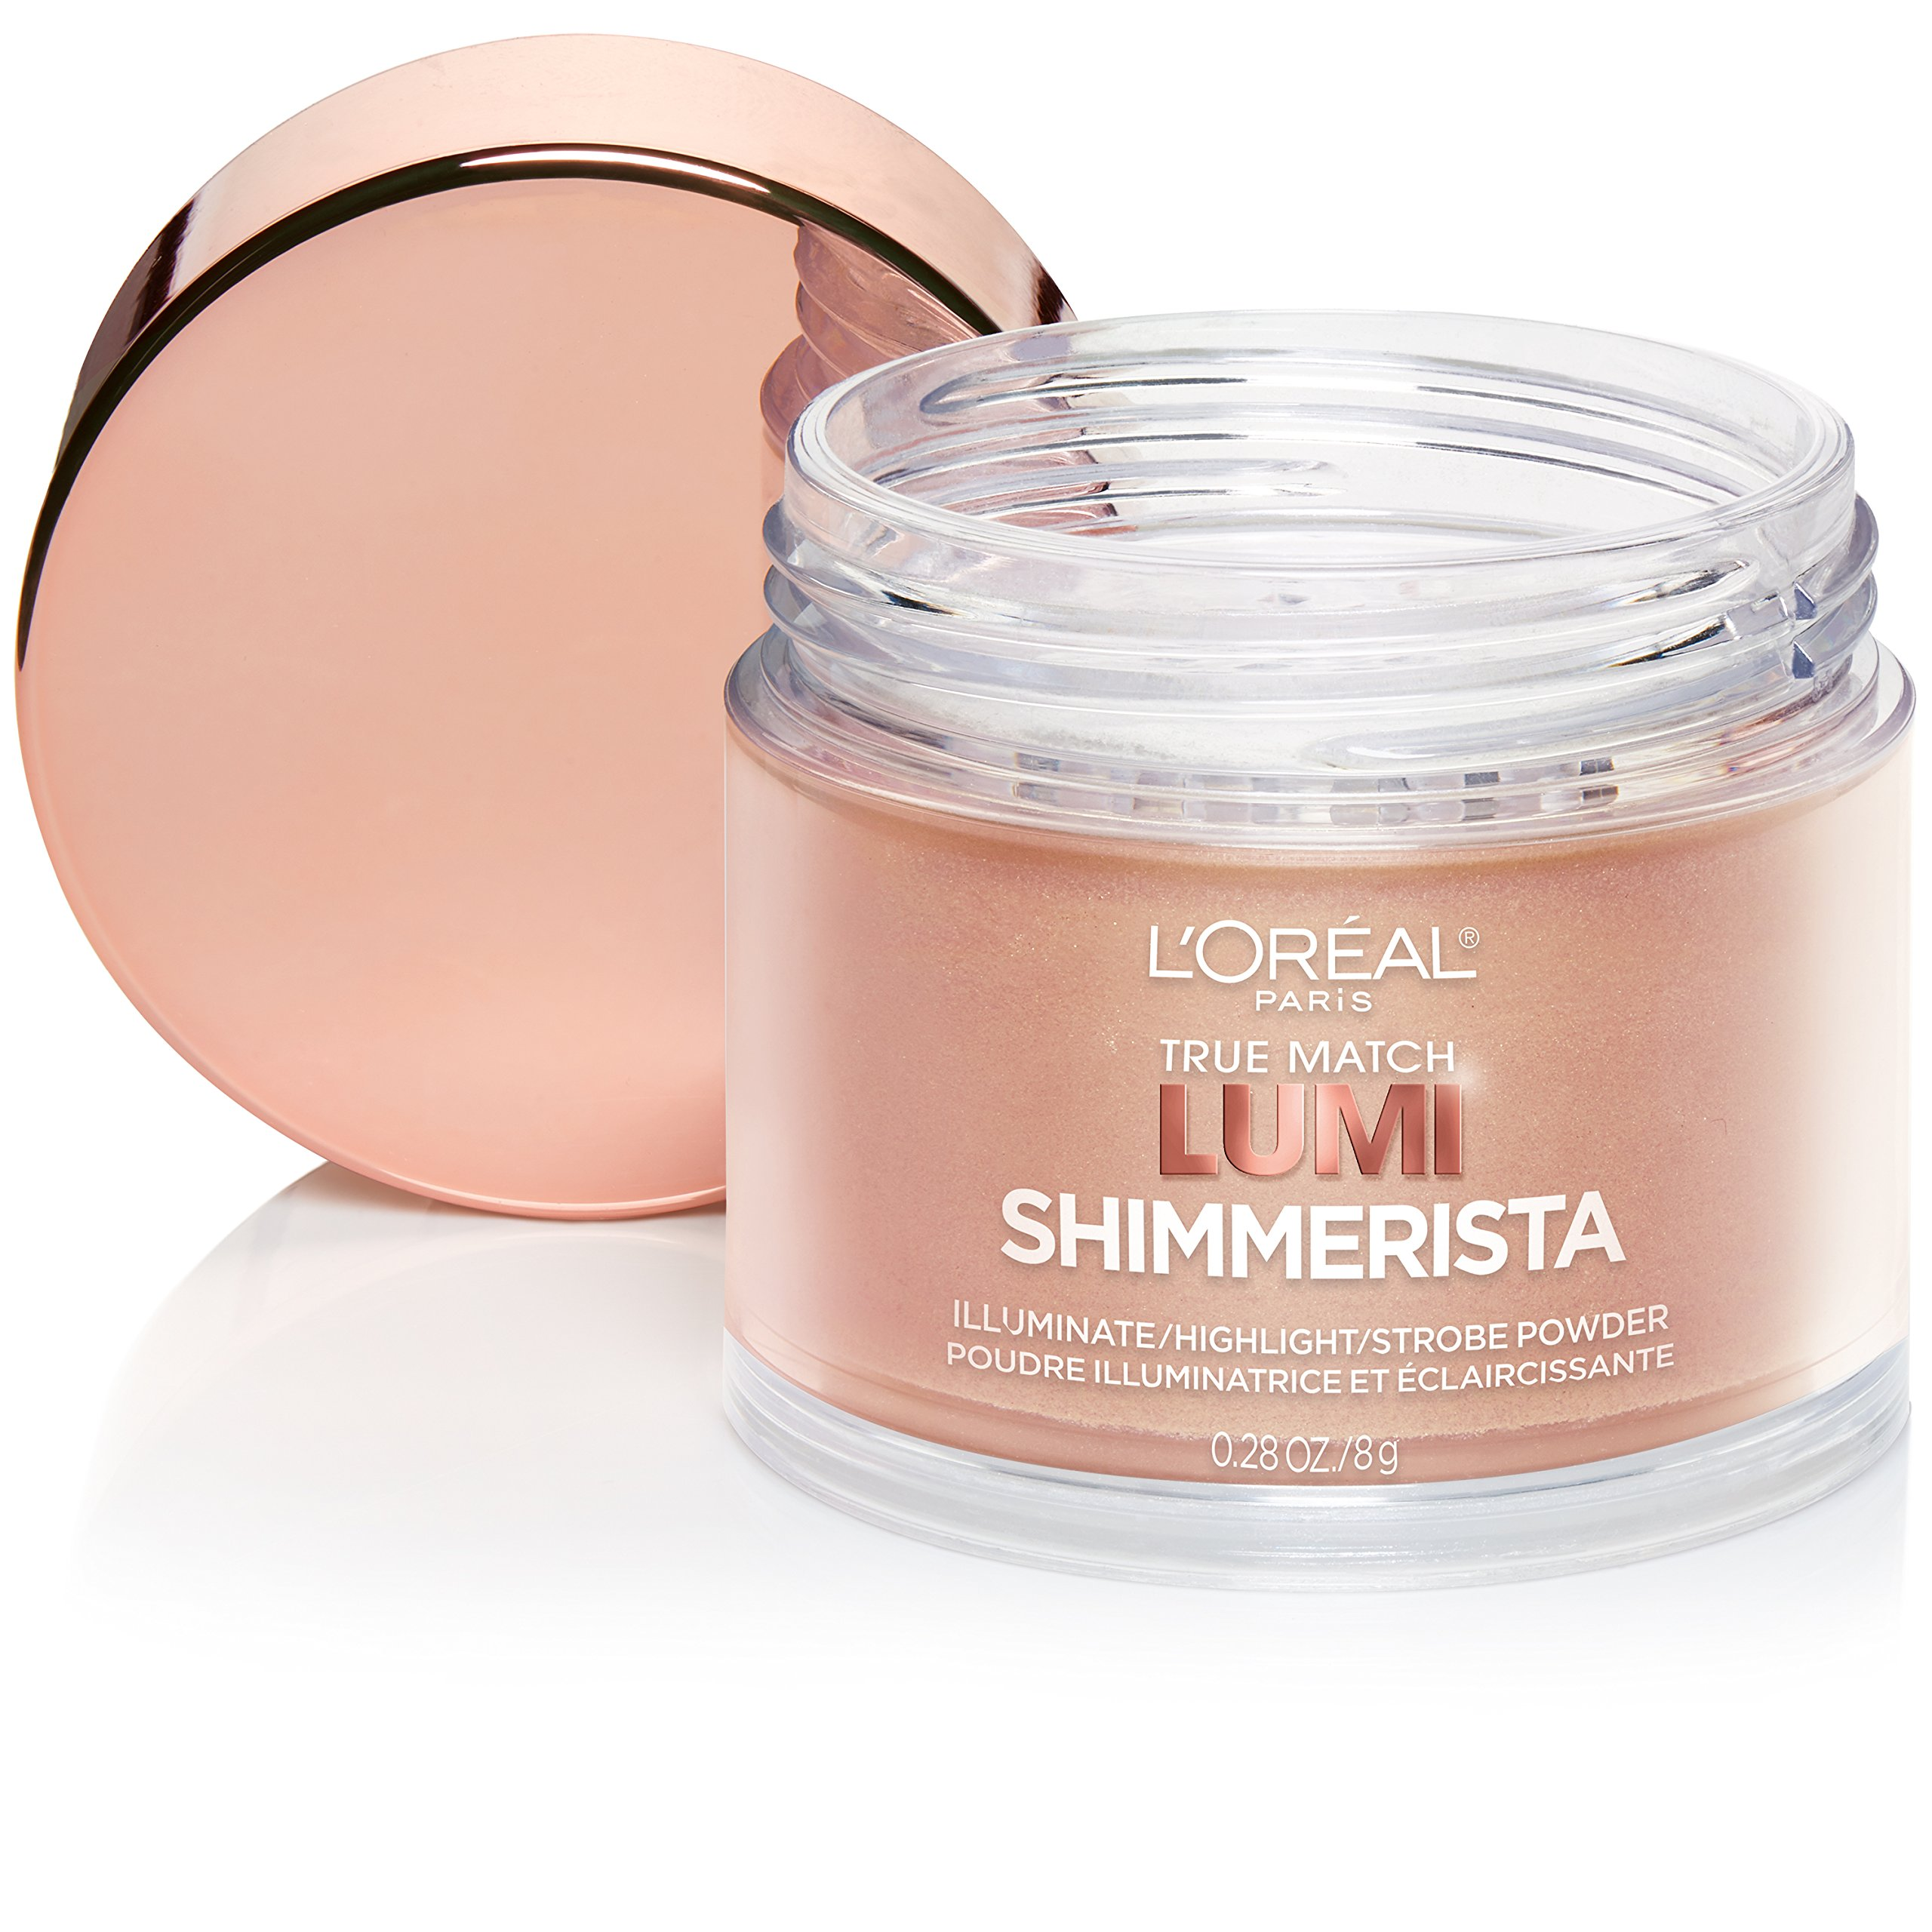 L'Oreal Paris Makeup True Match Lumi Shimmerista Loose Highlighting Powder, Sunlight, 0.28 oz.